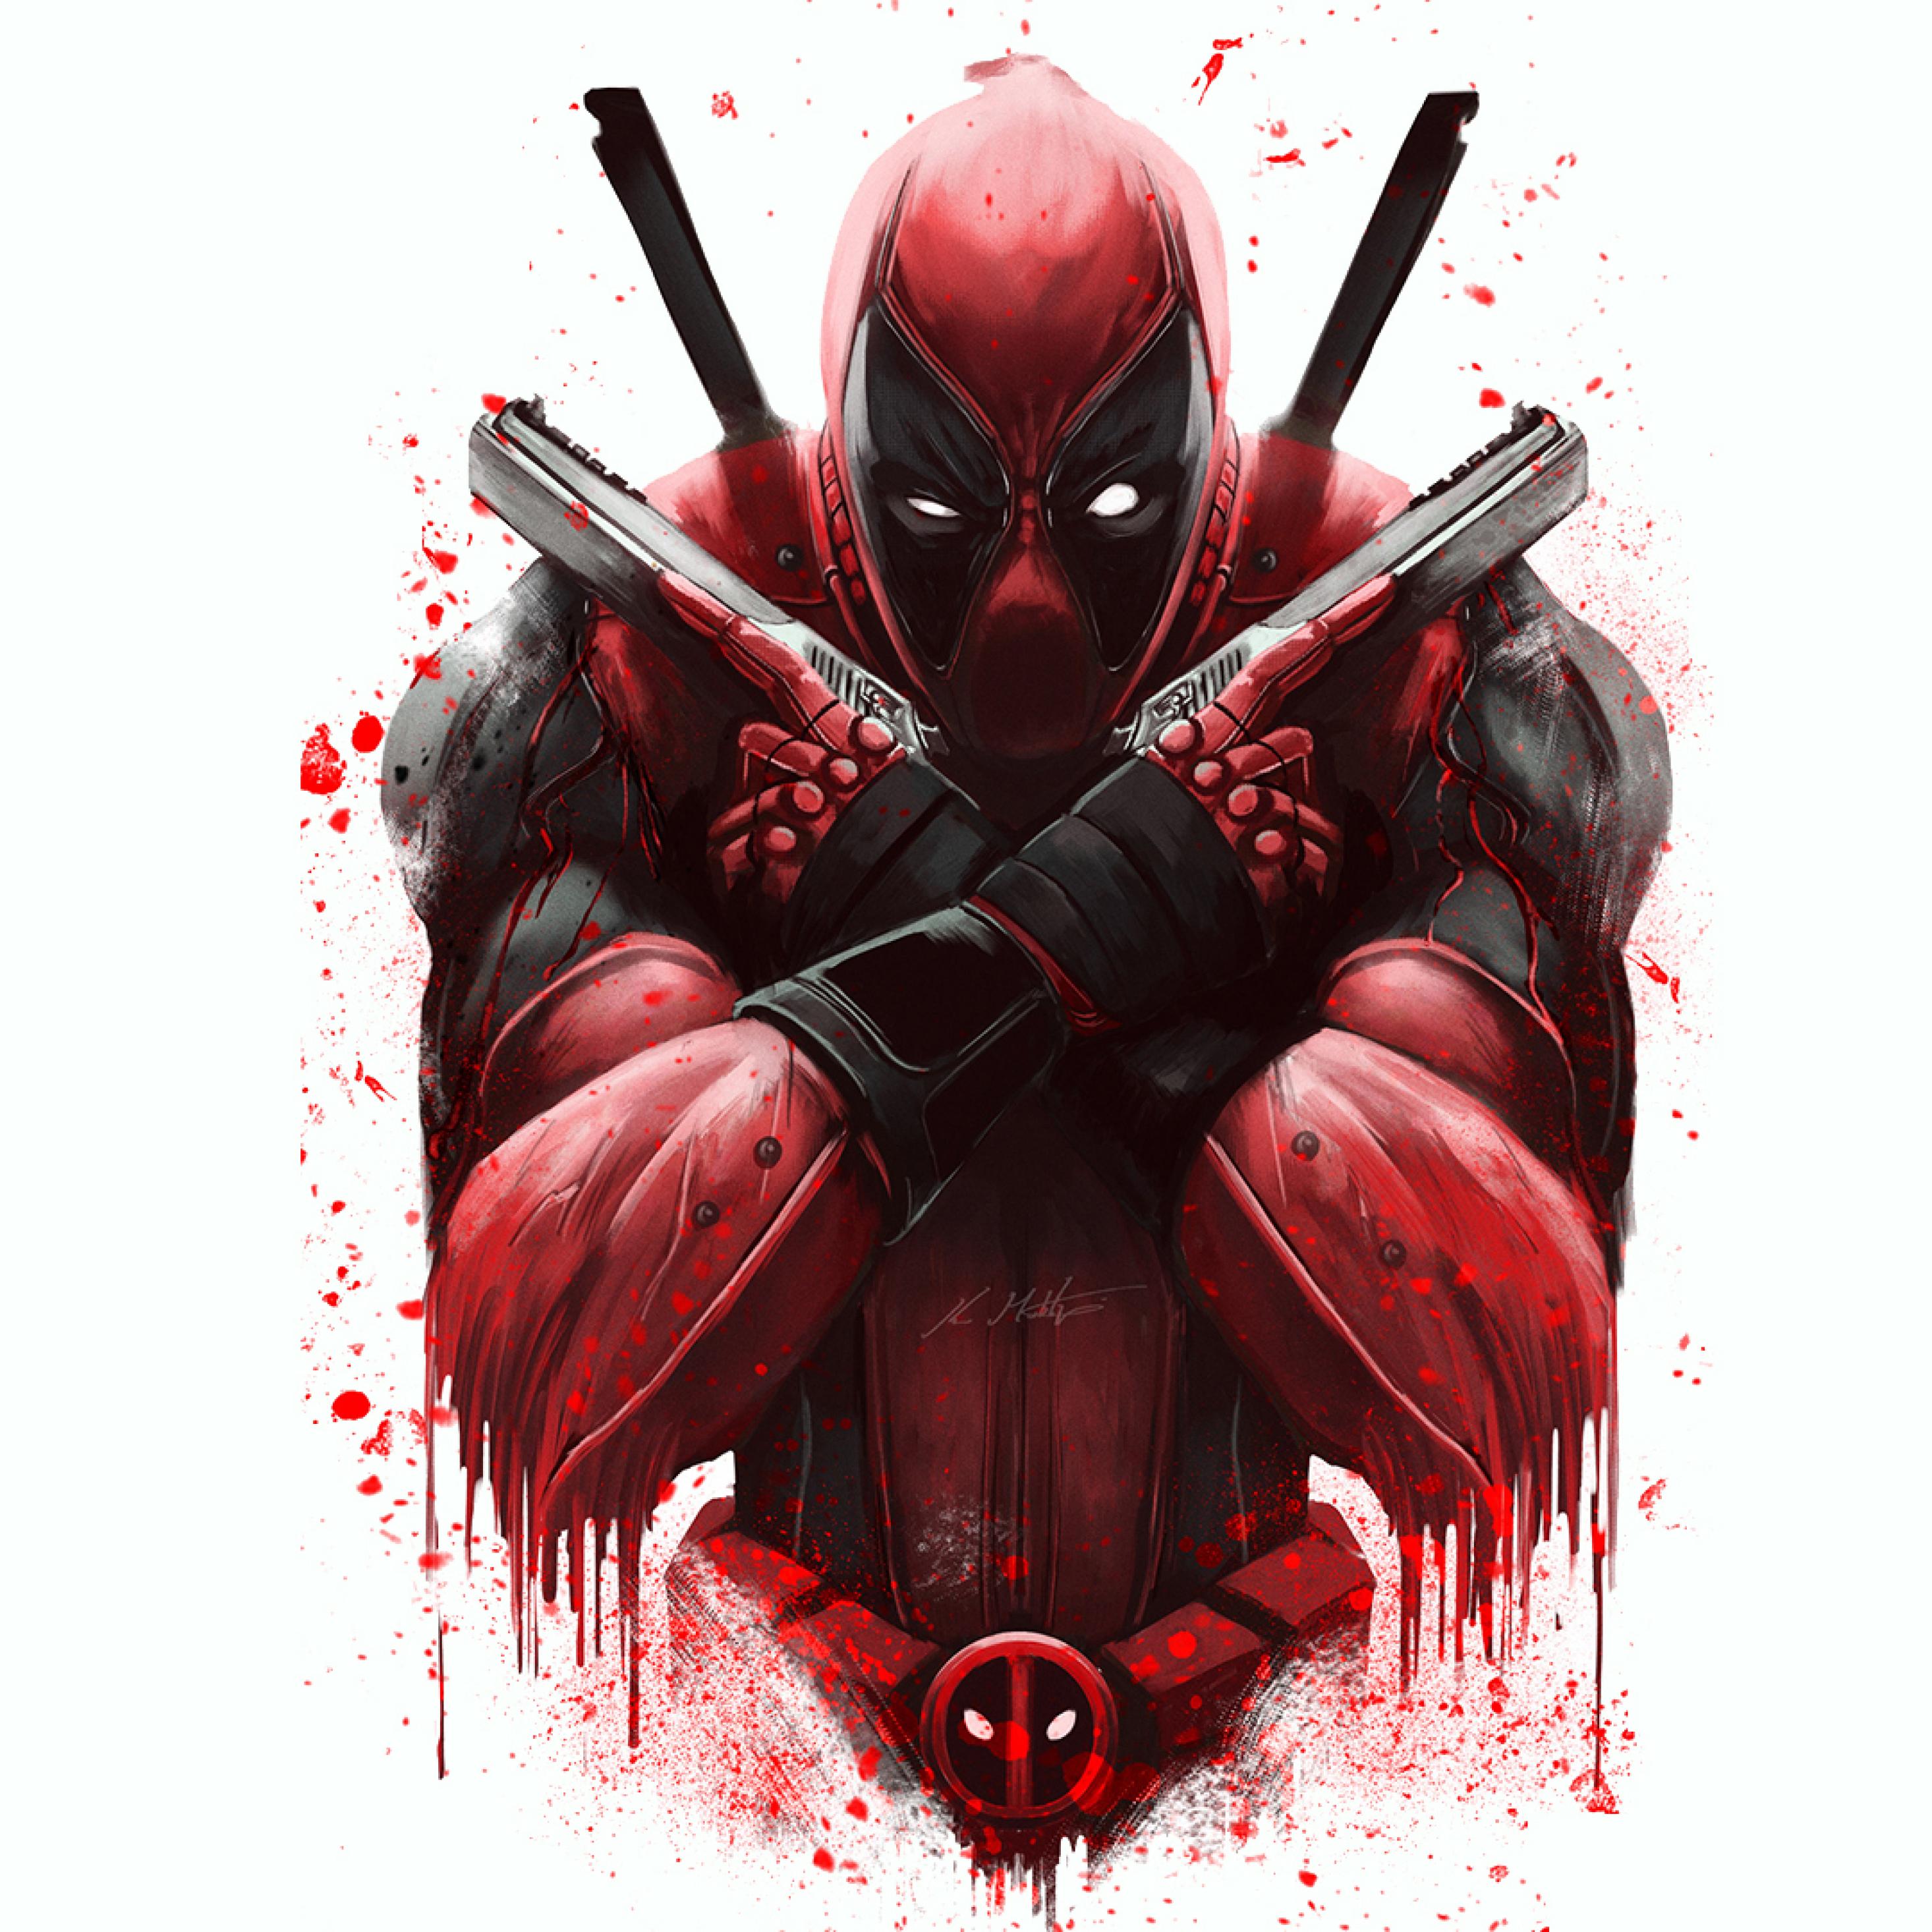 Marvel Deadpool Artwork, Full HD Wallpaper